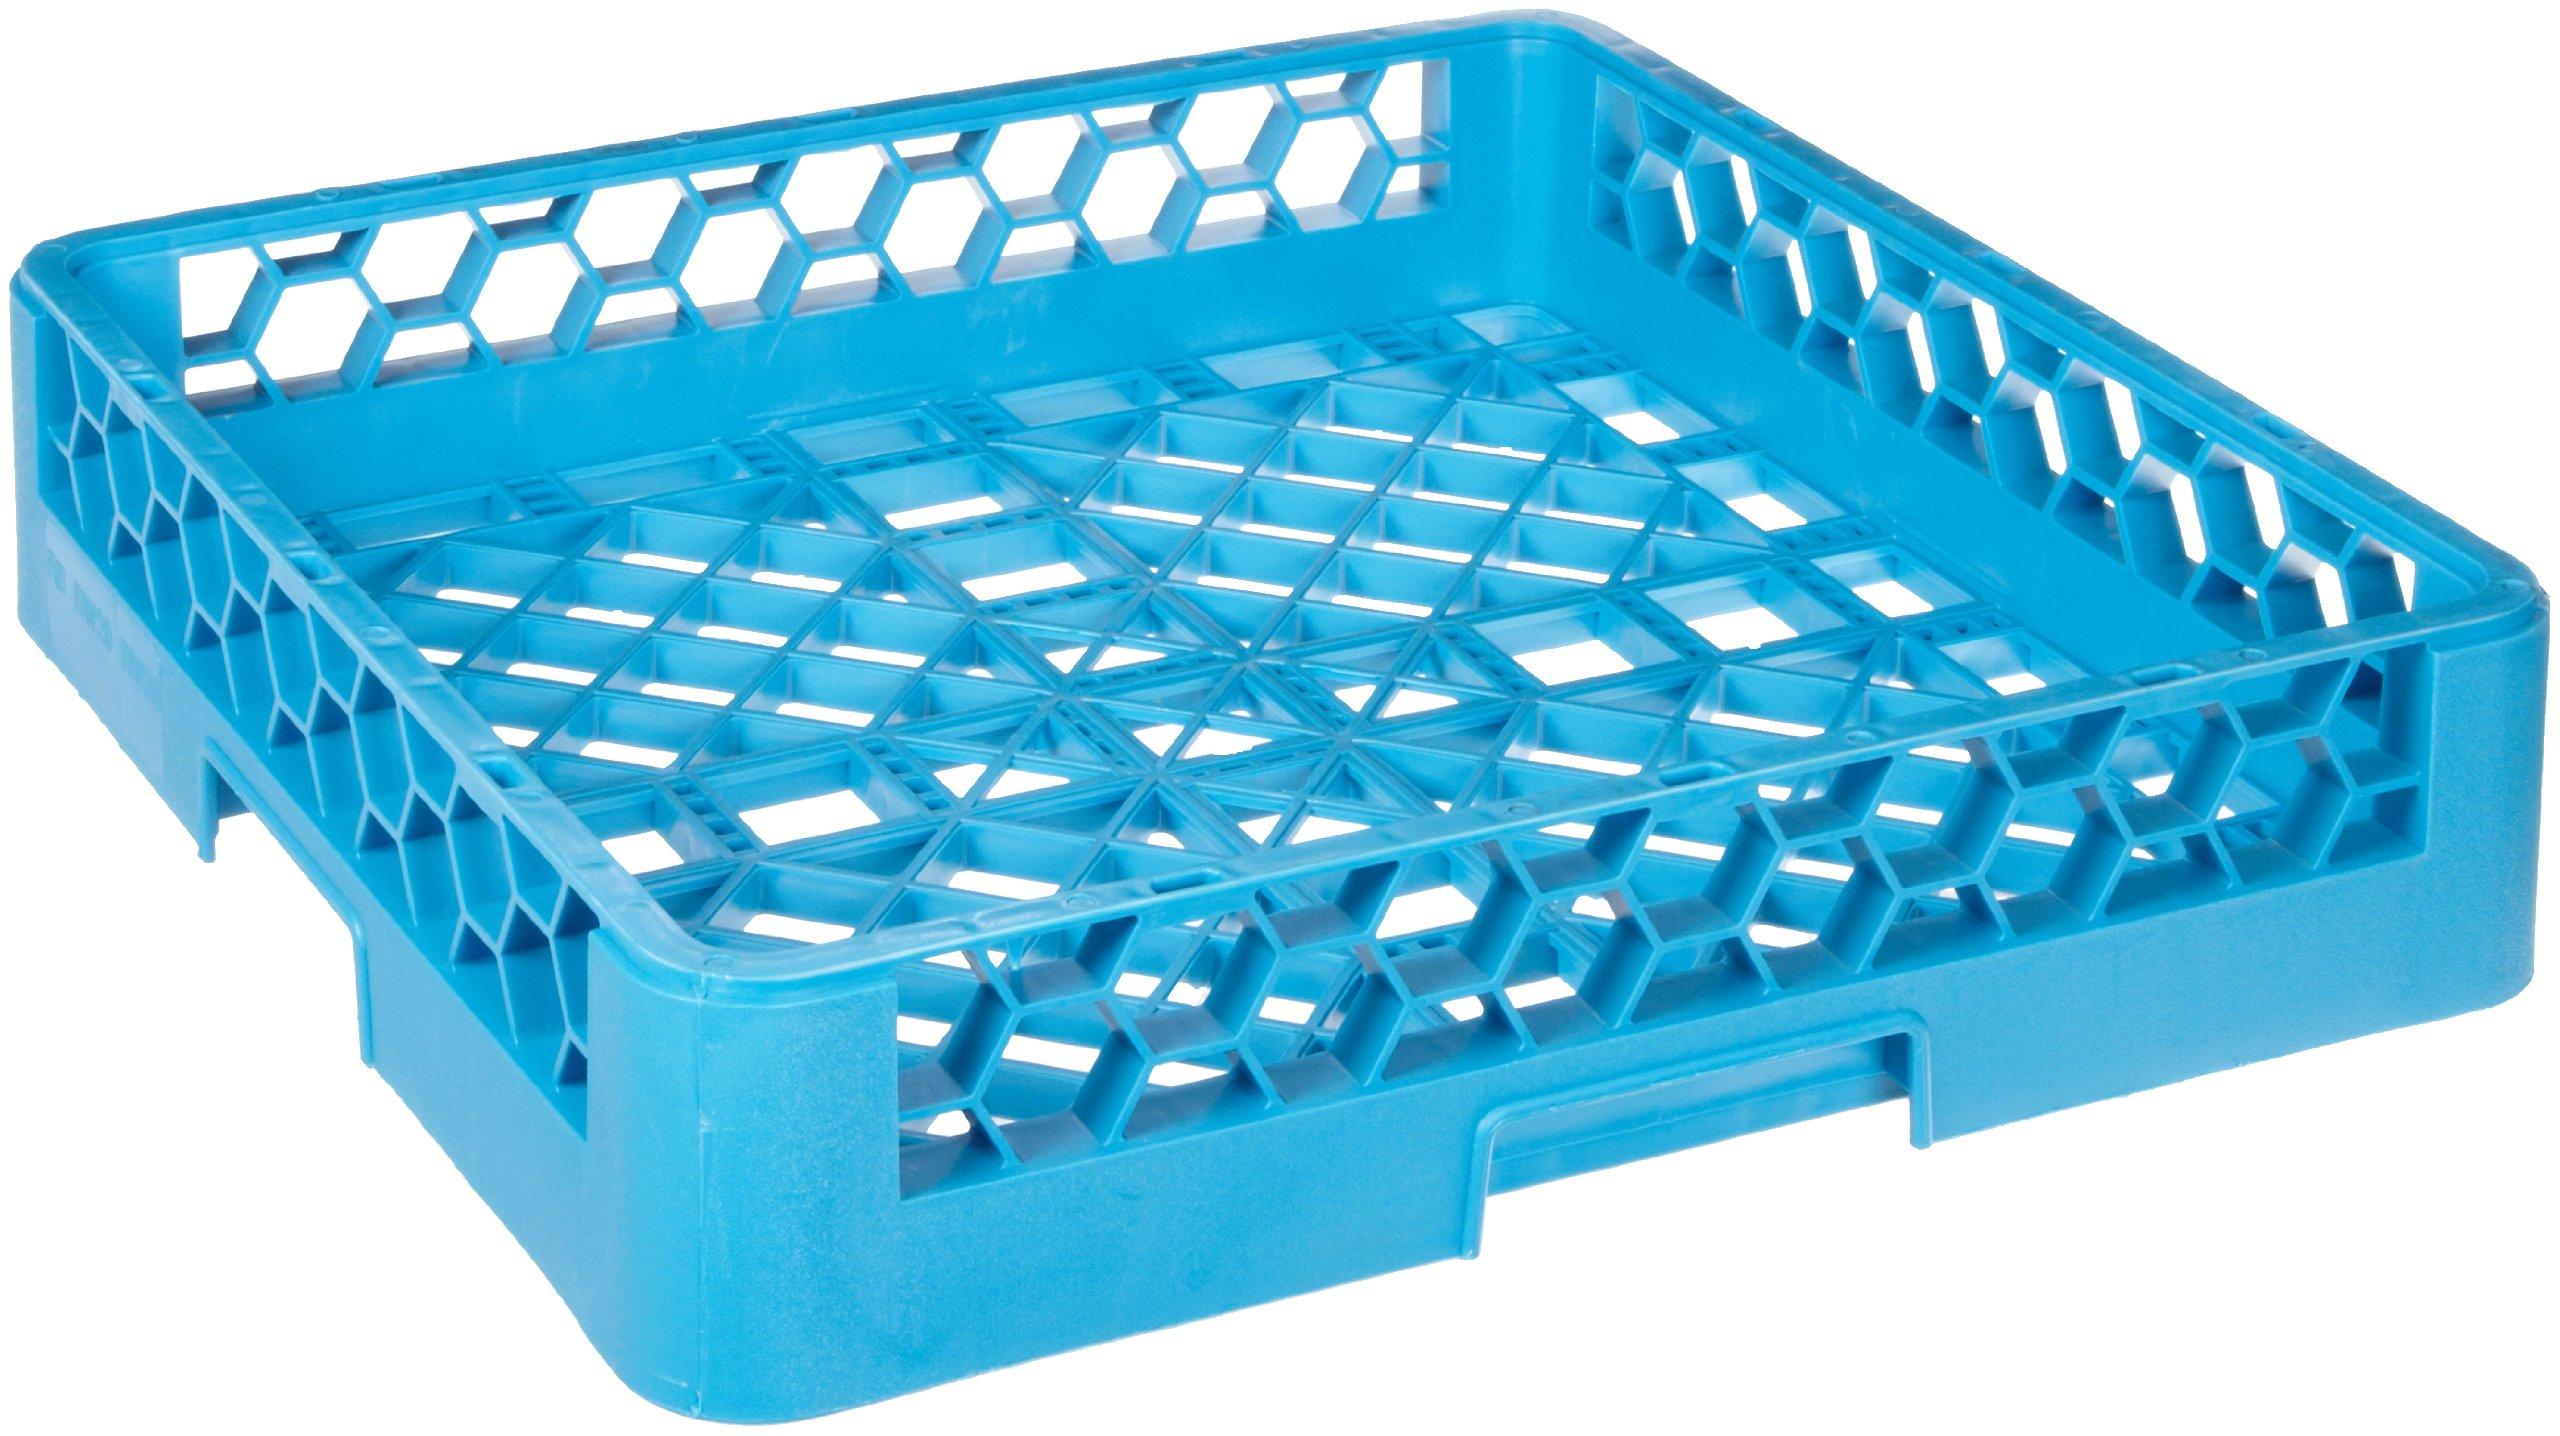 Carlisle RB14 OptiClean Polypropylene Open/Bowl Rack, 19.75 x 19.75 x 4'', Carlisle Blue (Case of 6)